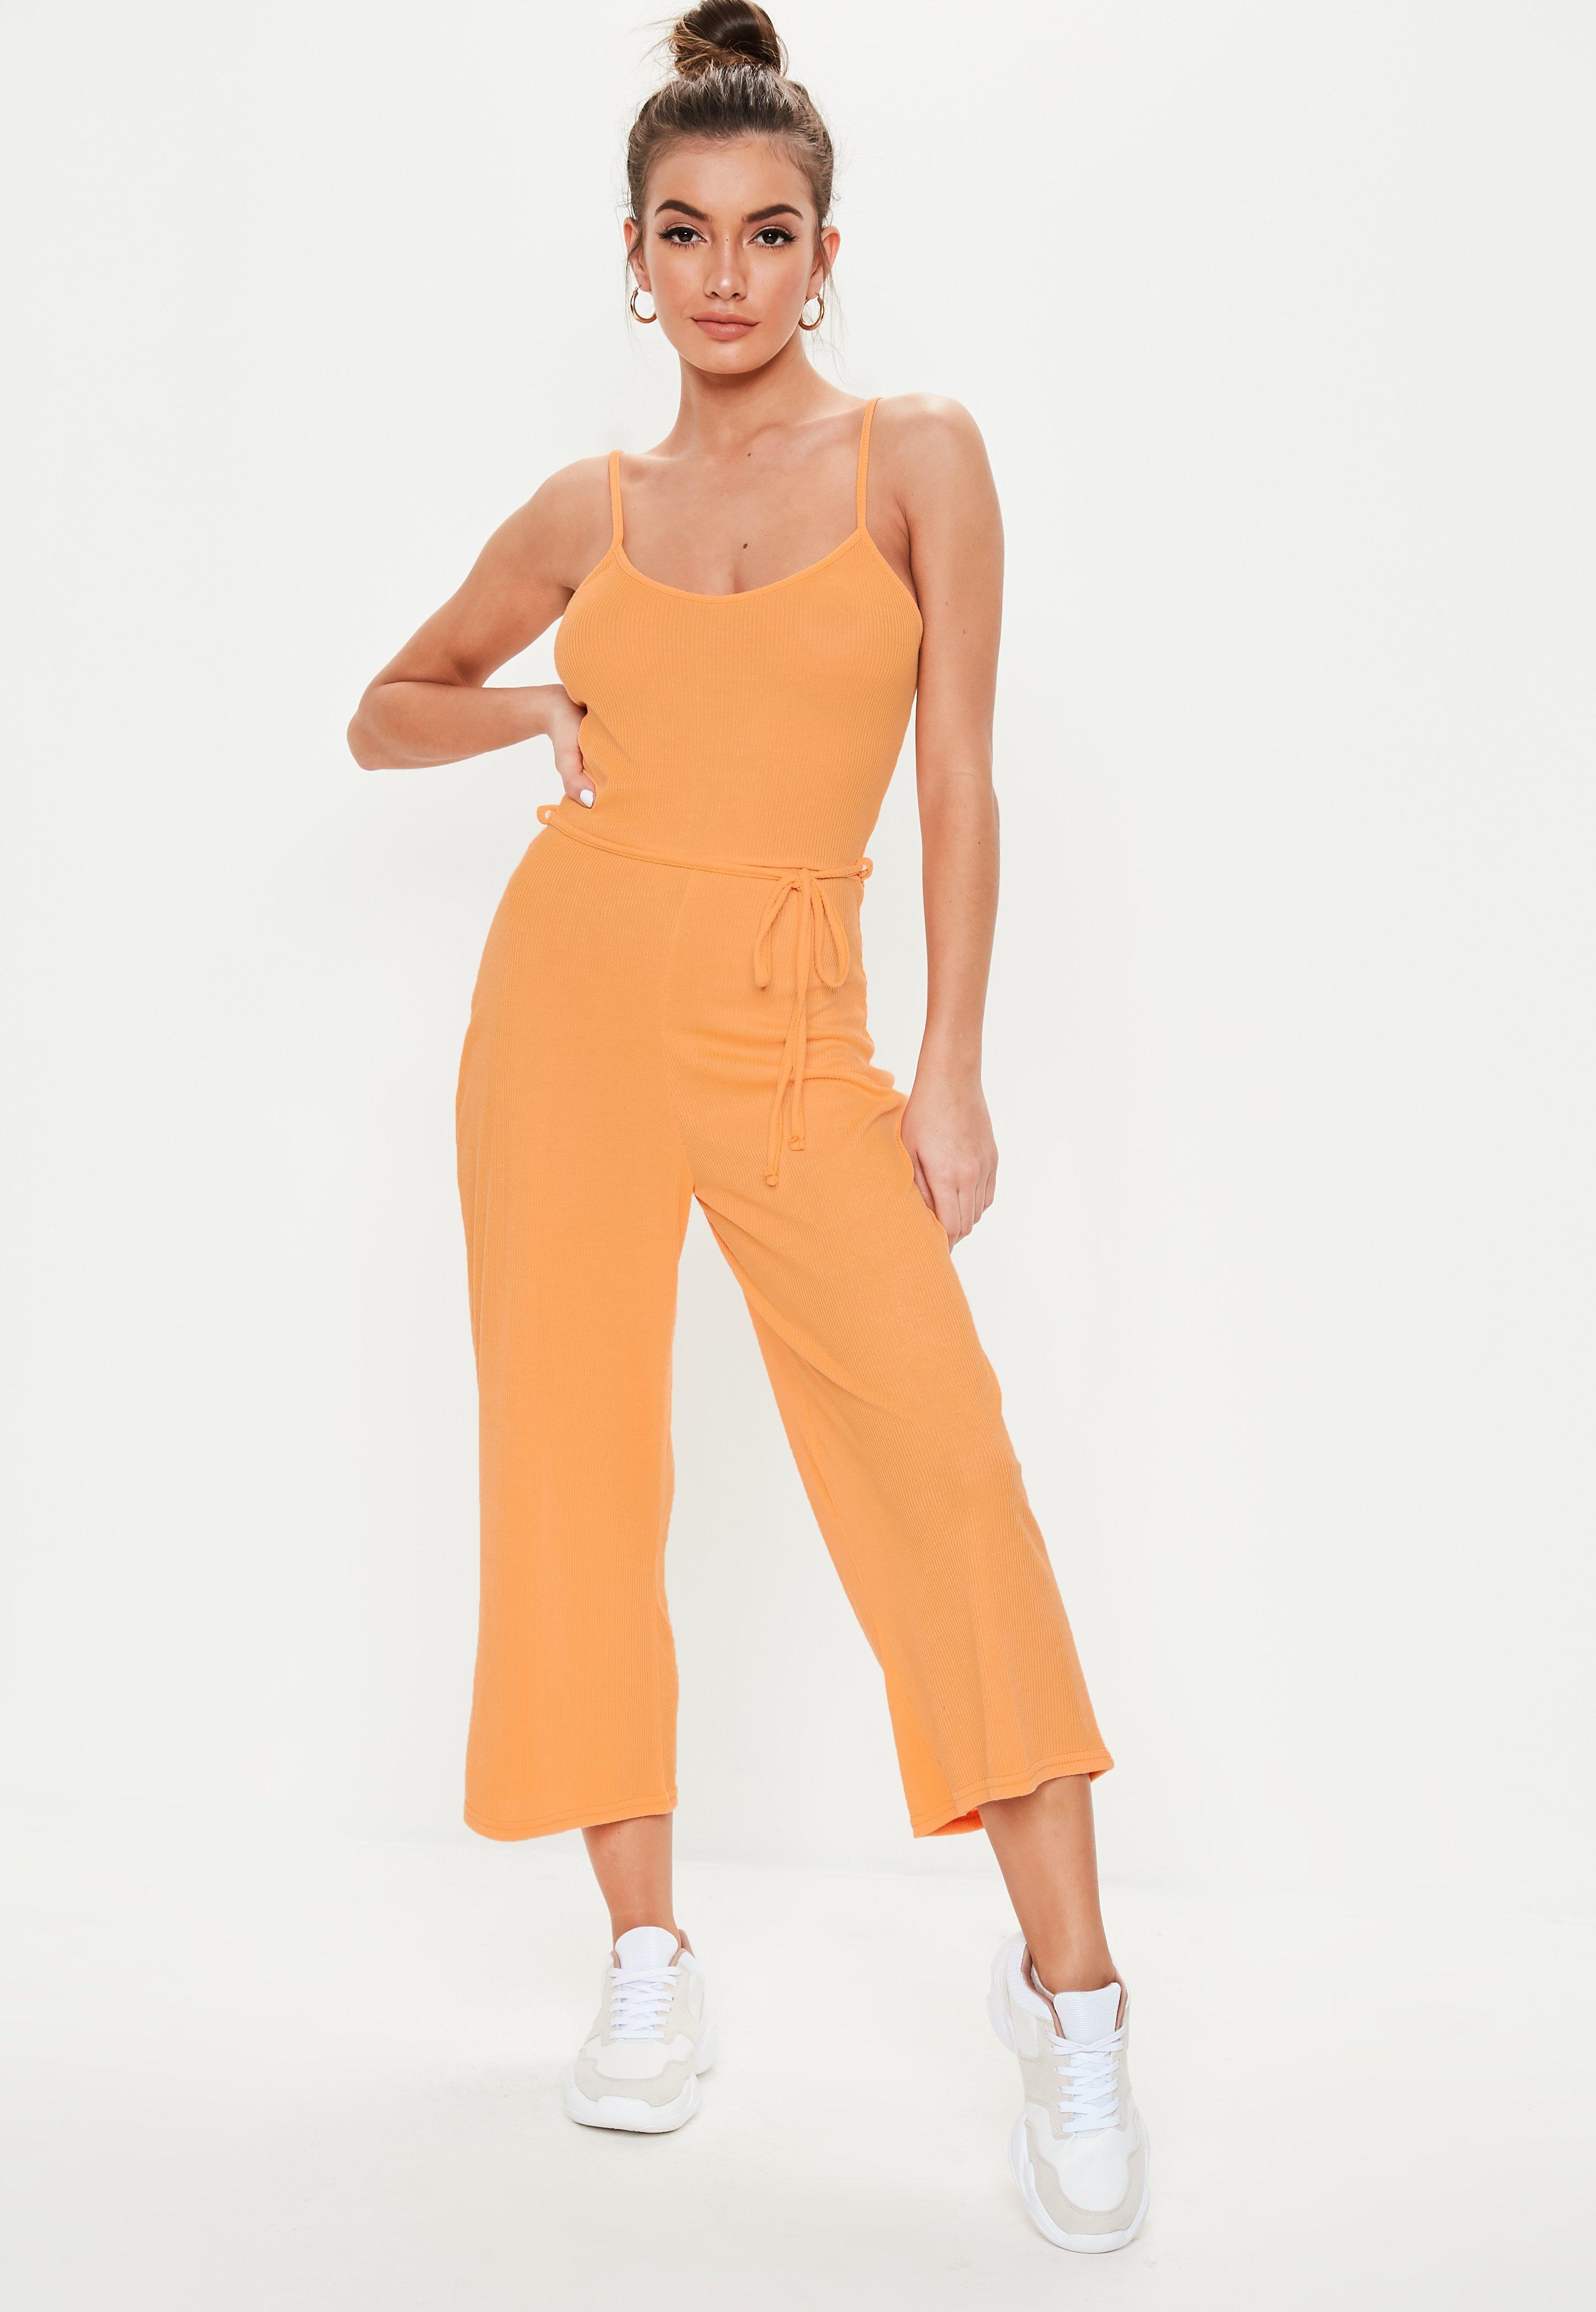 5ed742d8fed Culotte Jumpsuits - Women s Cropped Jumpsuits